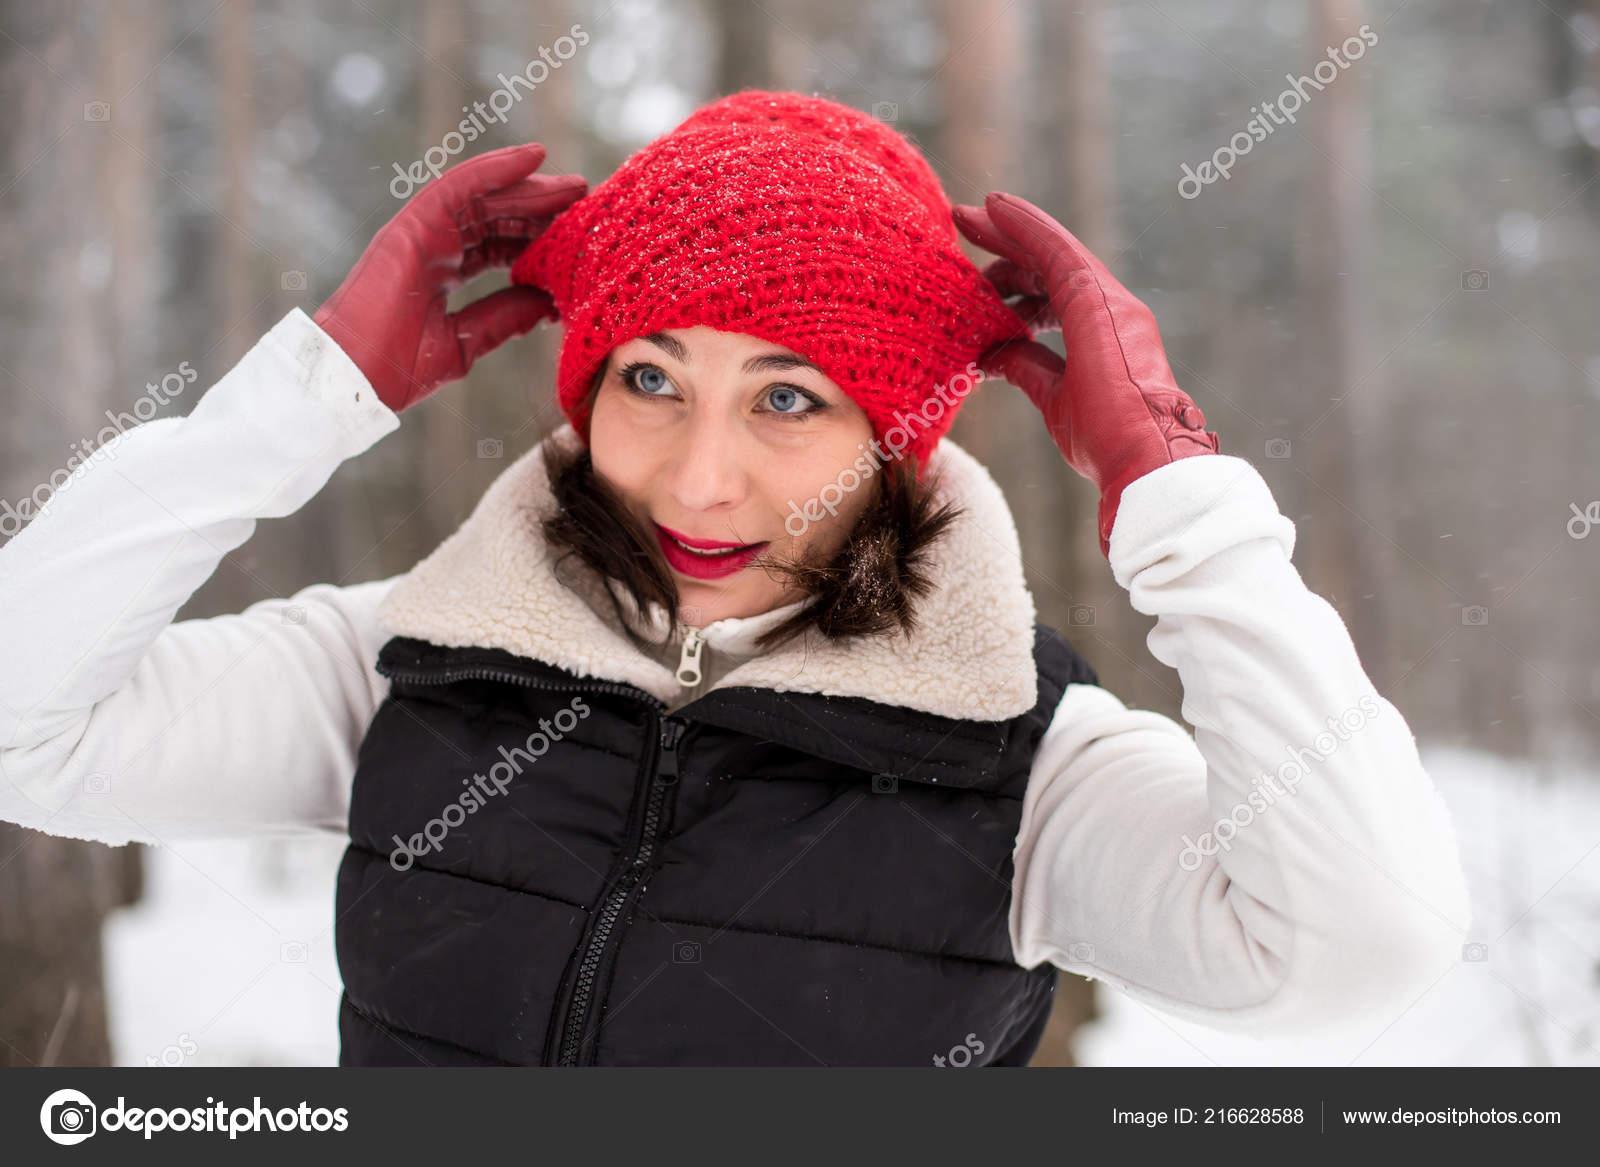 Retrato Menina Gorro Vermelho Casaco Quente Floresta Dia Inverno —  Fotografia de Stock 6fbfcaaaa83